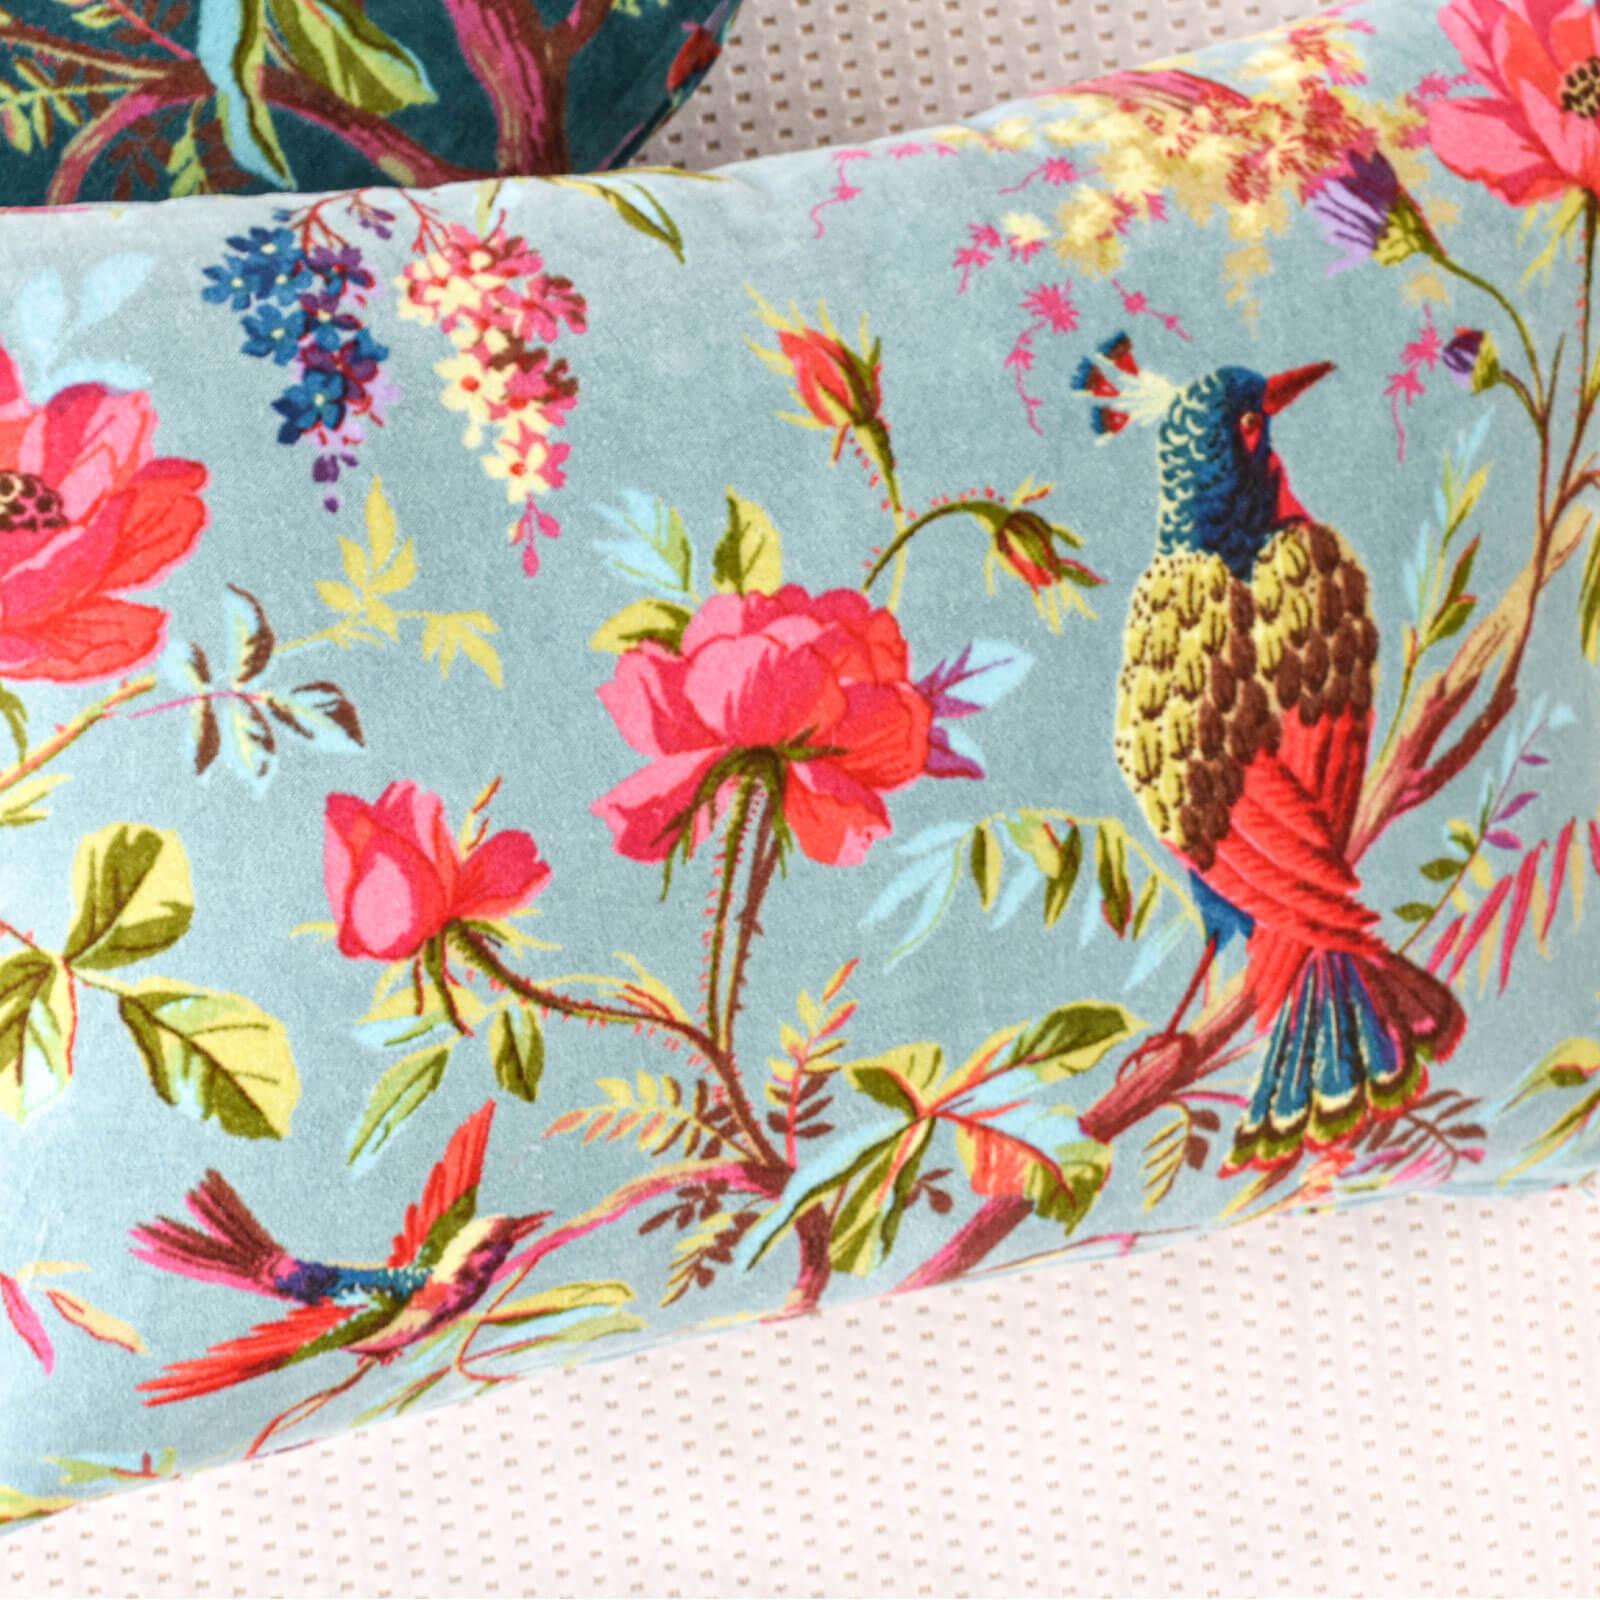 birds-in-paradise-cushion-dubai